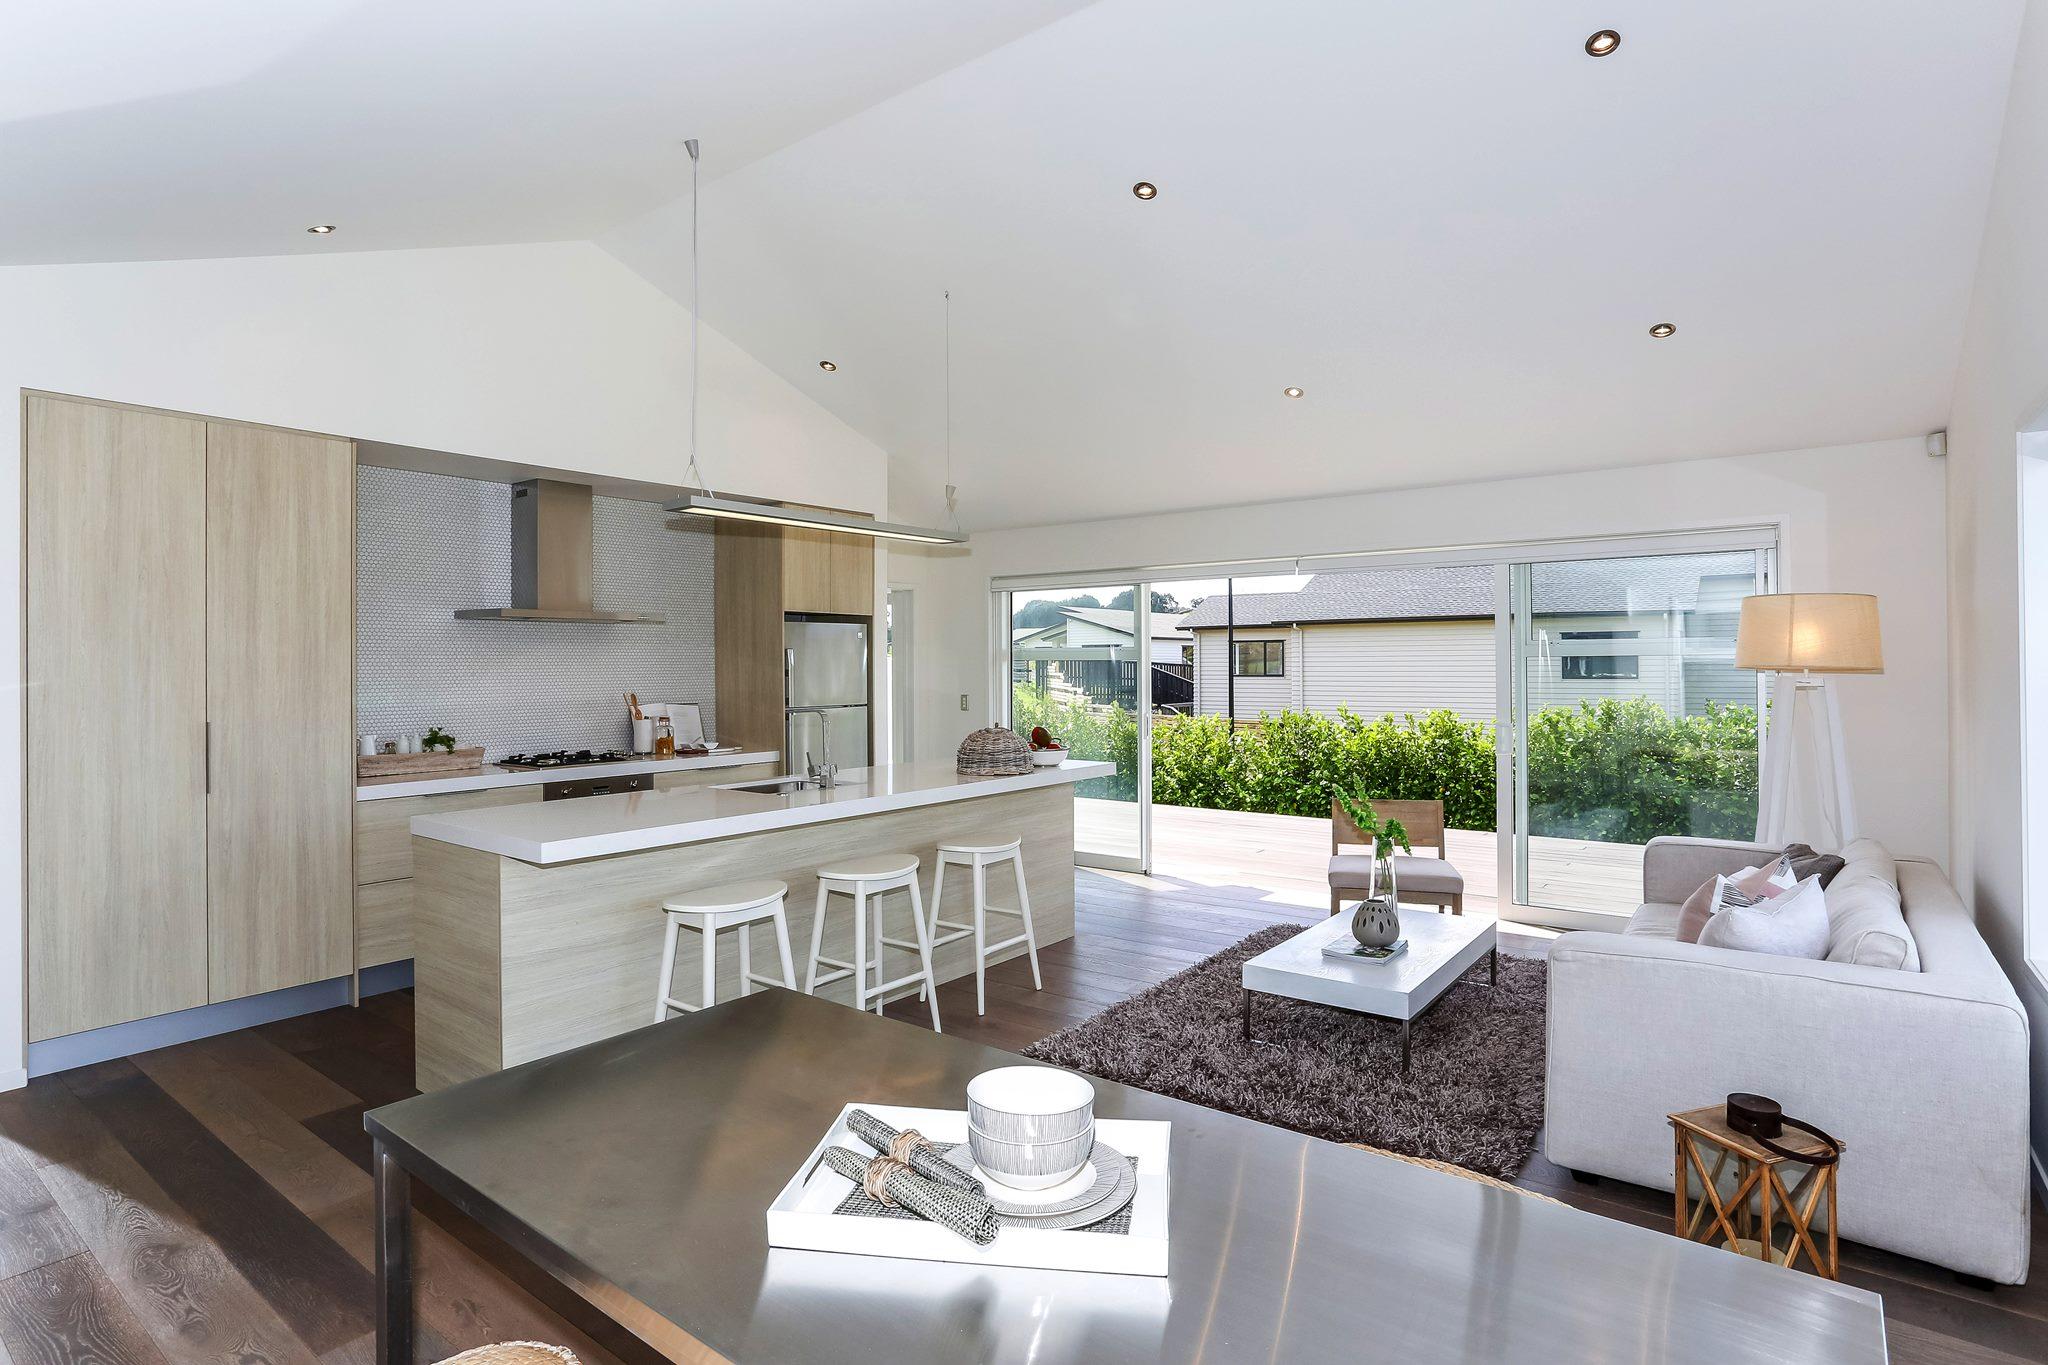 Home Design Store Parnell Shop Living Edge